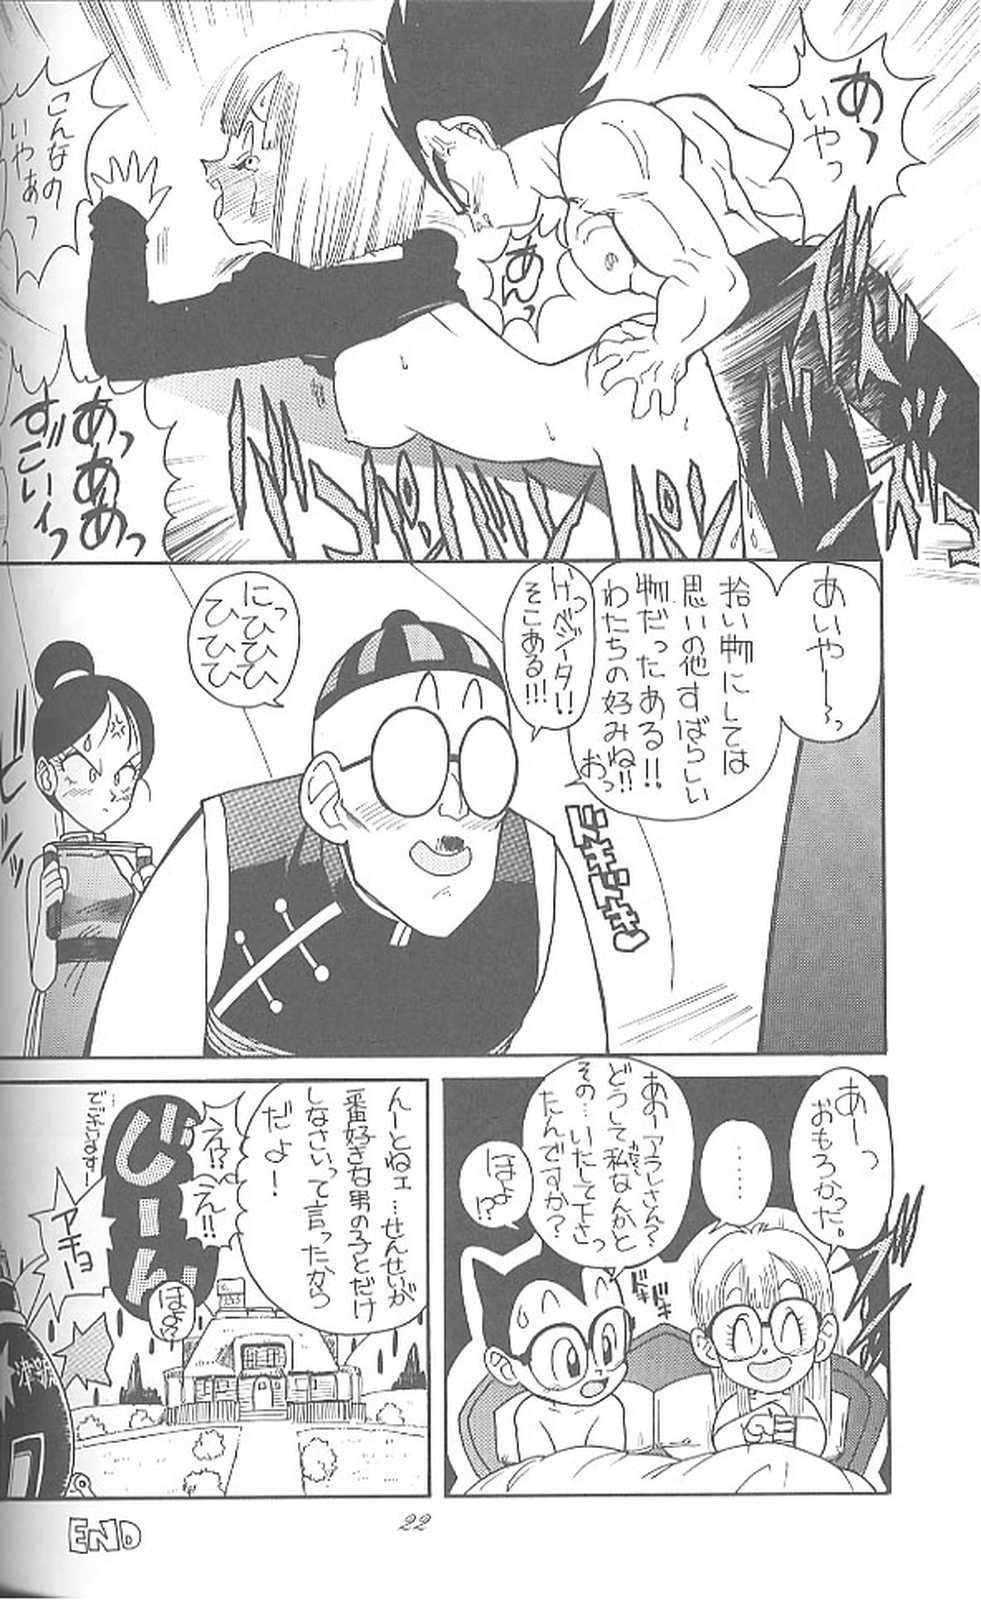 Haraharatokei vol.4 20